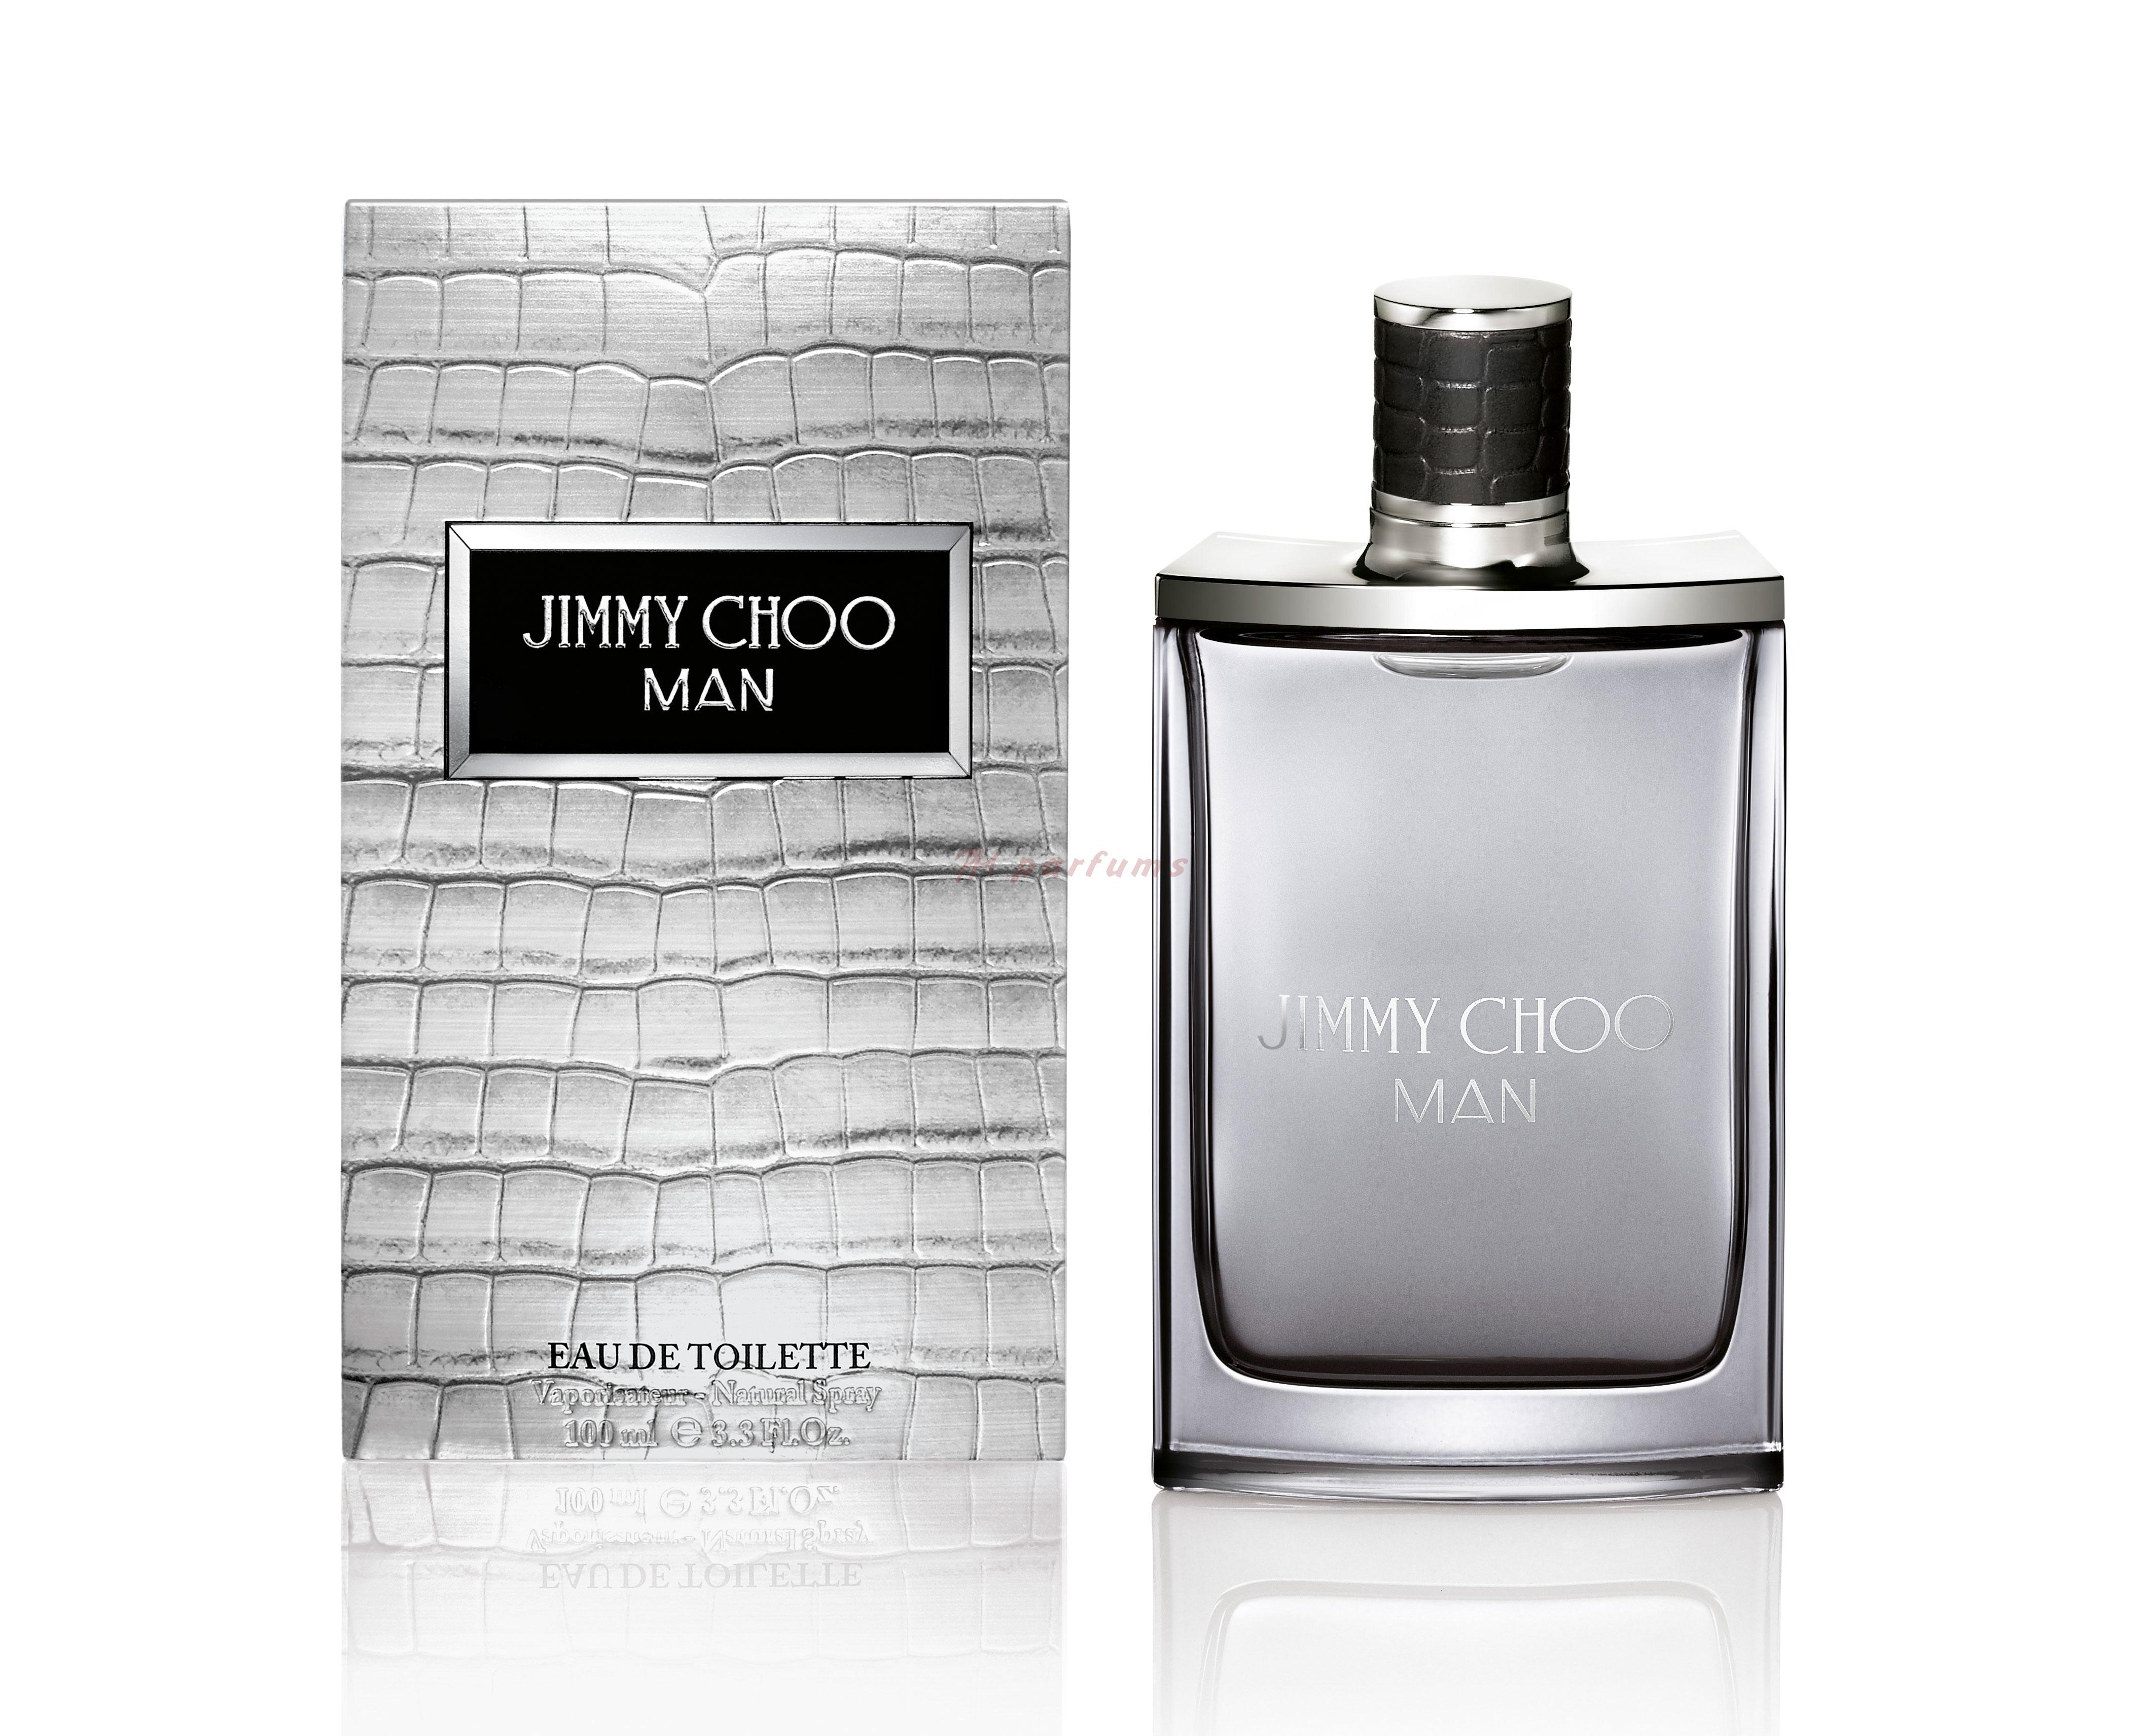 Jimmy Choo Man